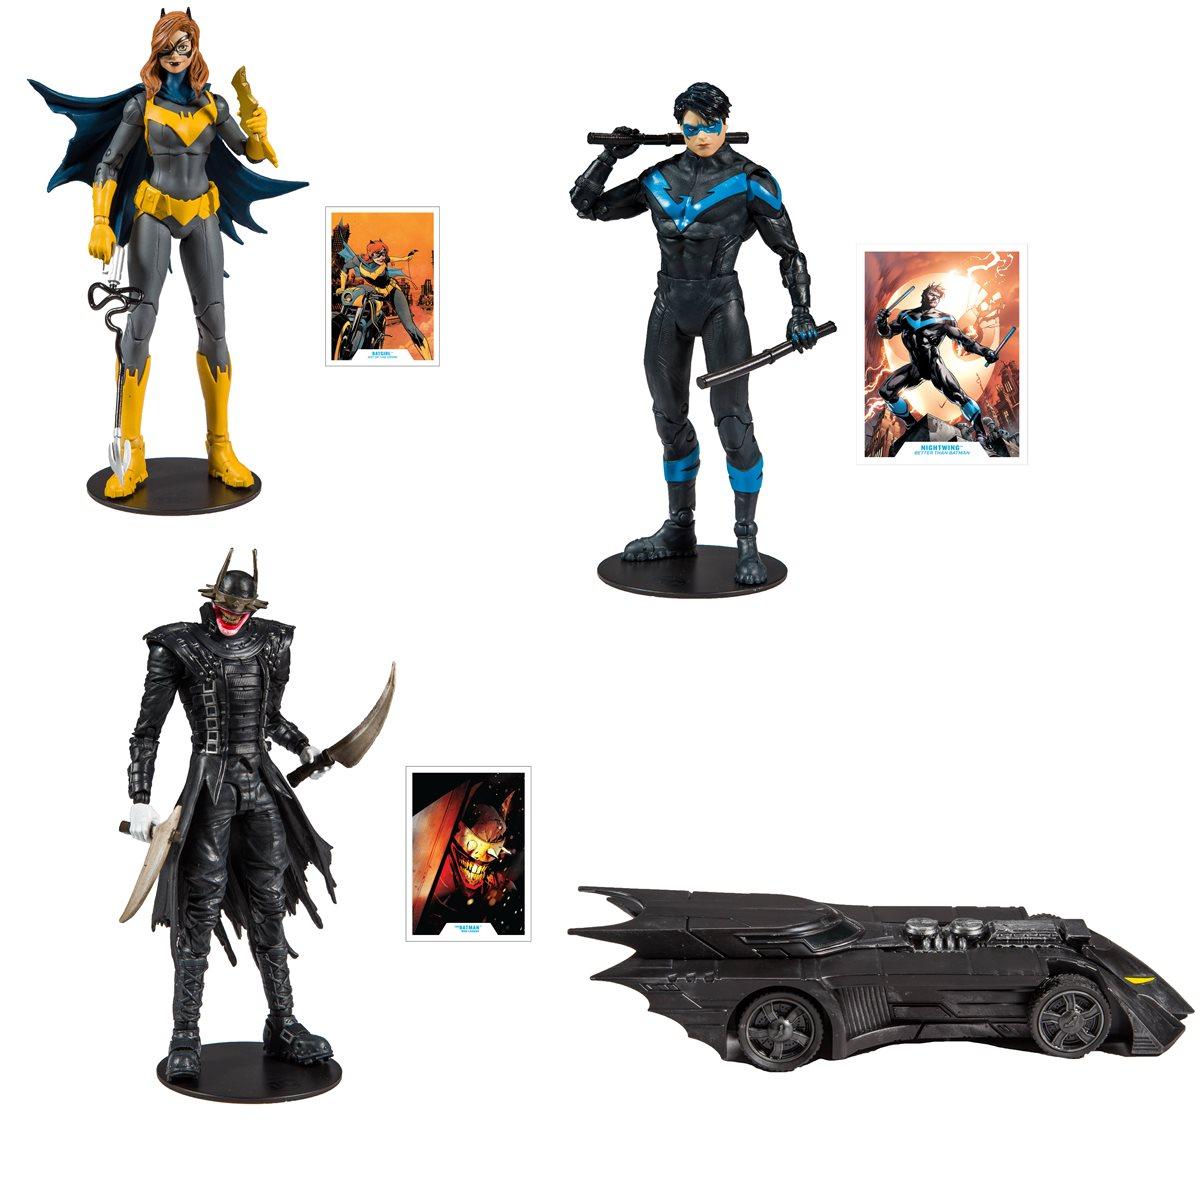 DC COMICS COLLECTOR WAVE 1 MODERN BATGIRL FIGURE MCFARLANE TOYS BATMAN PREORDER